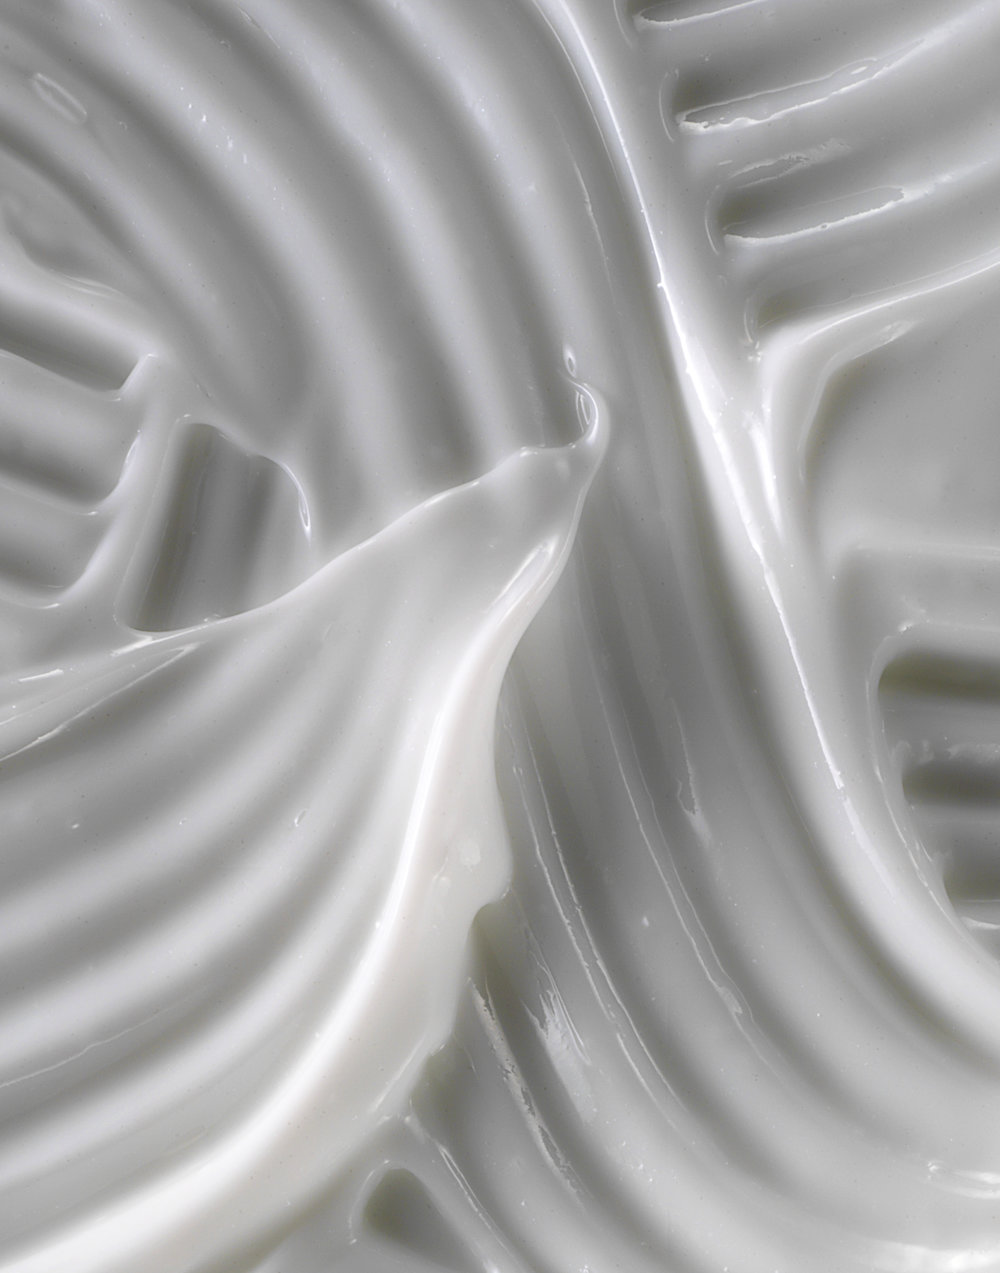 Background texture=Cream=02-26-09=img014-1.jpg